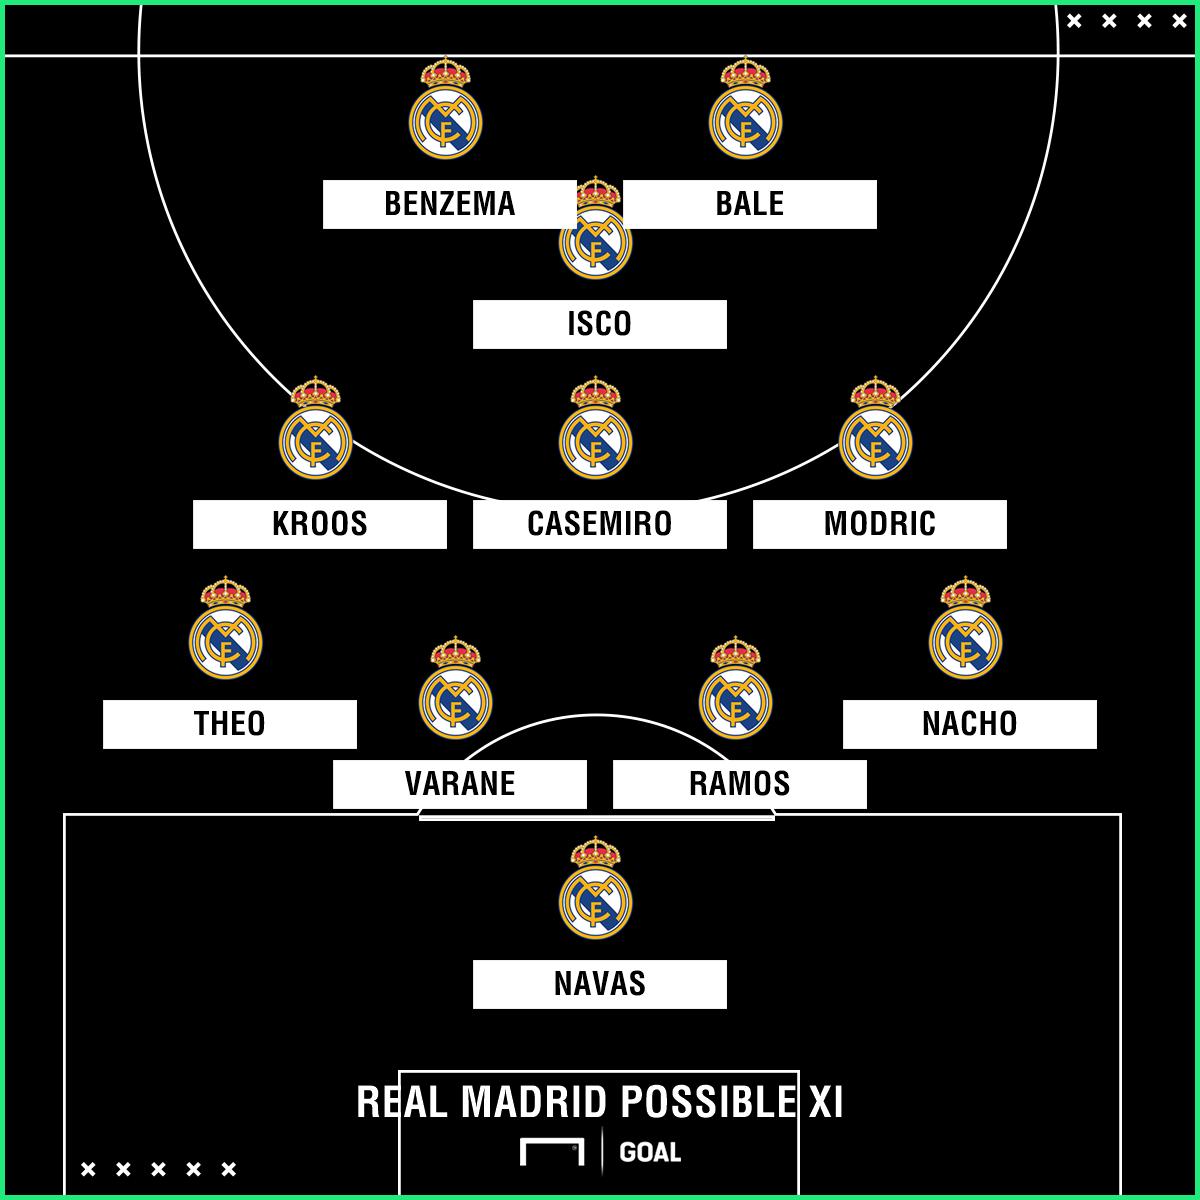 Real Madrid possible XI Las Palmas